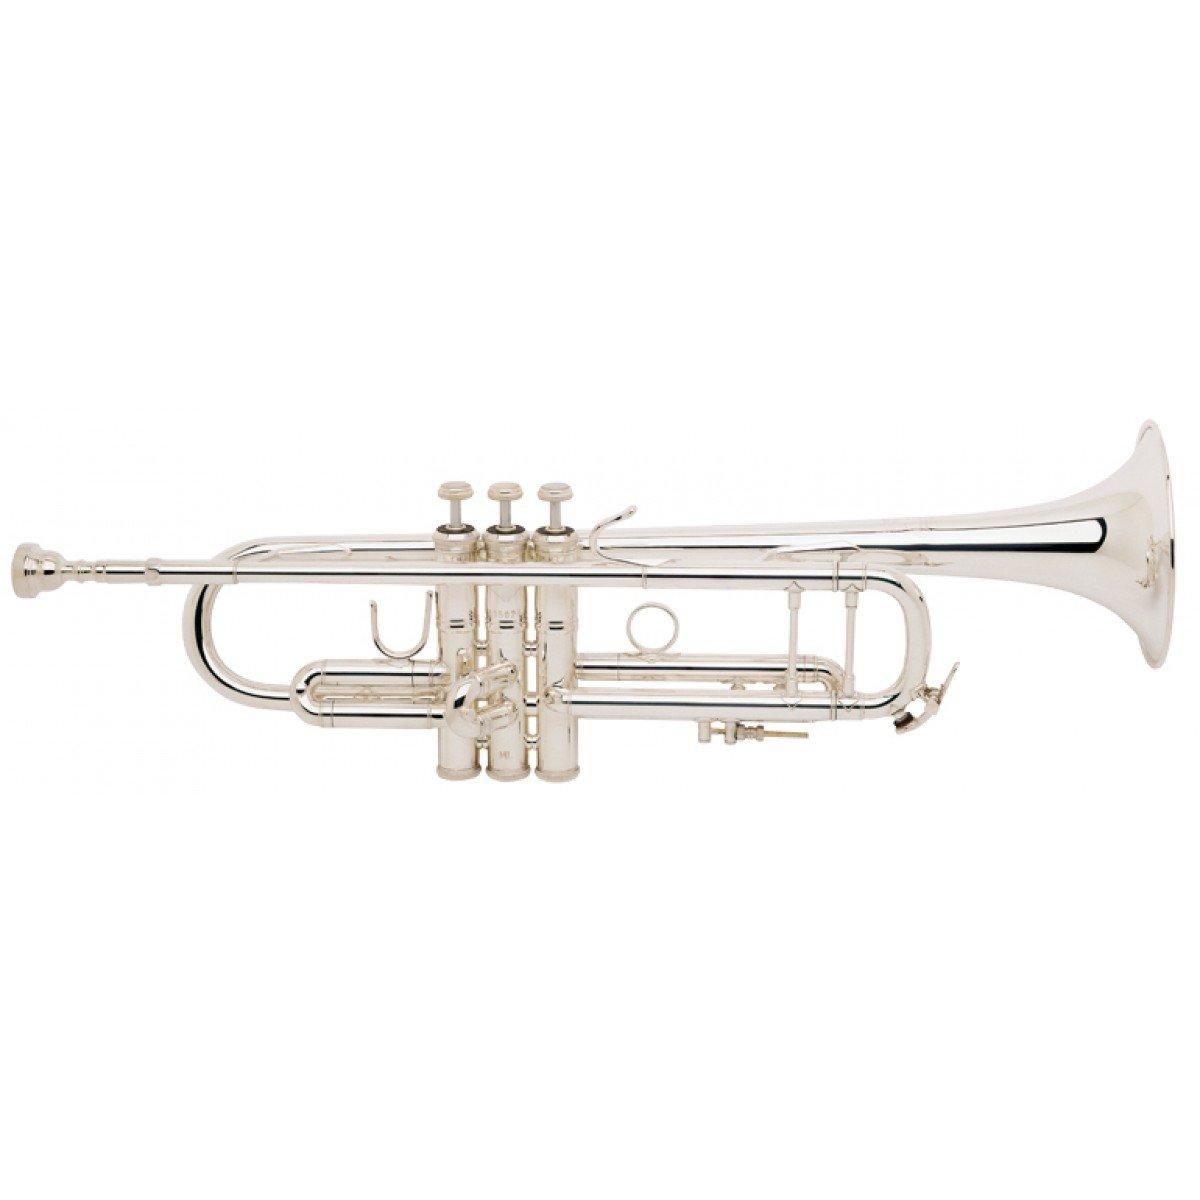 LT180S-37 Stradivarius